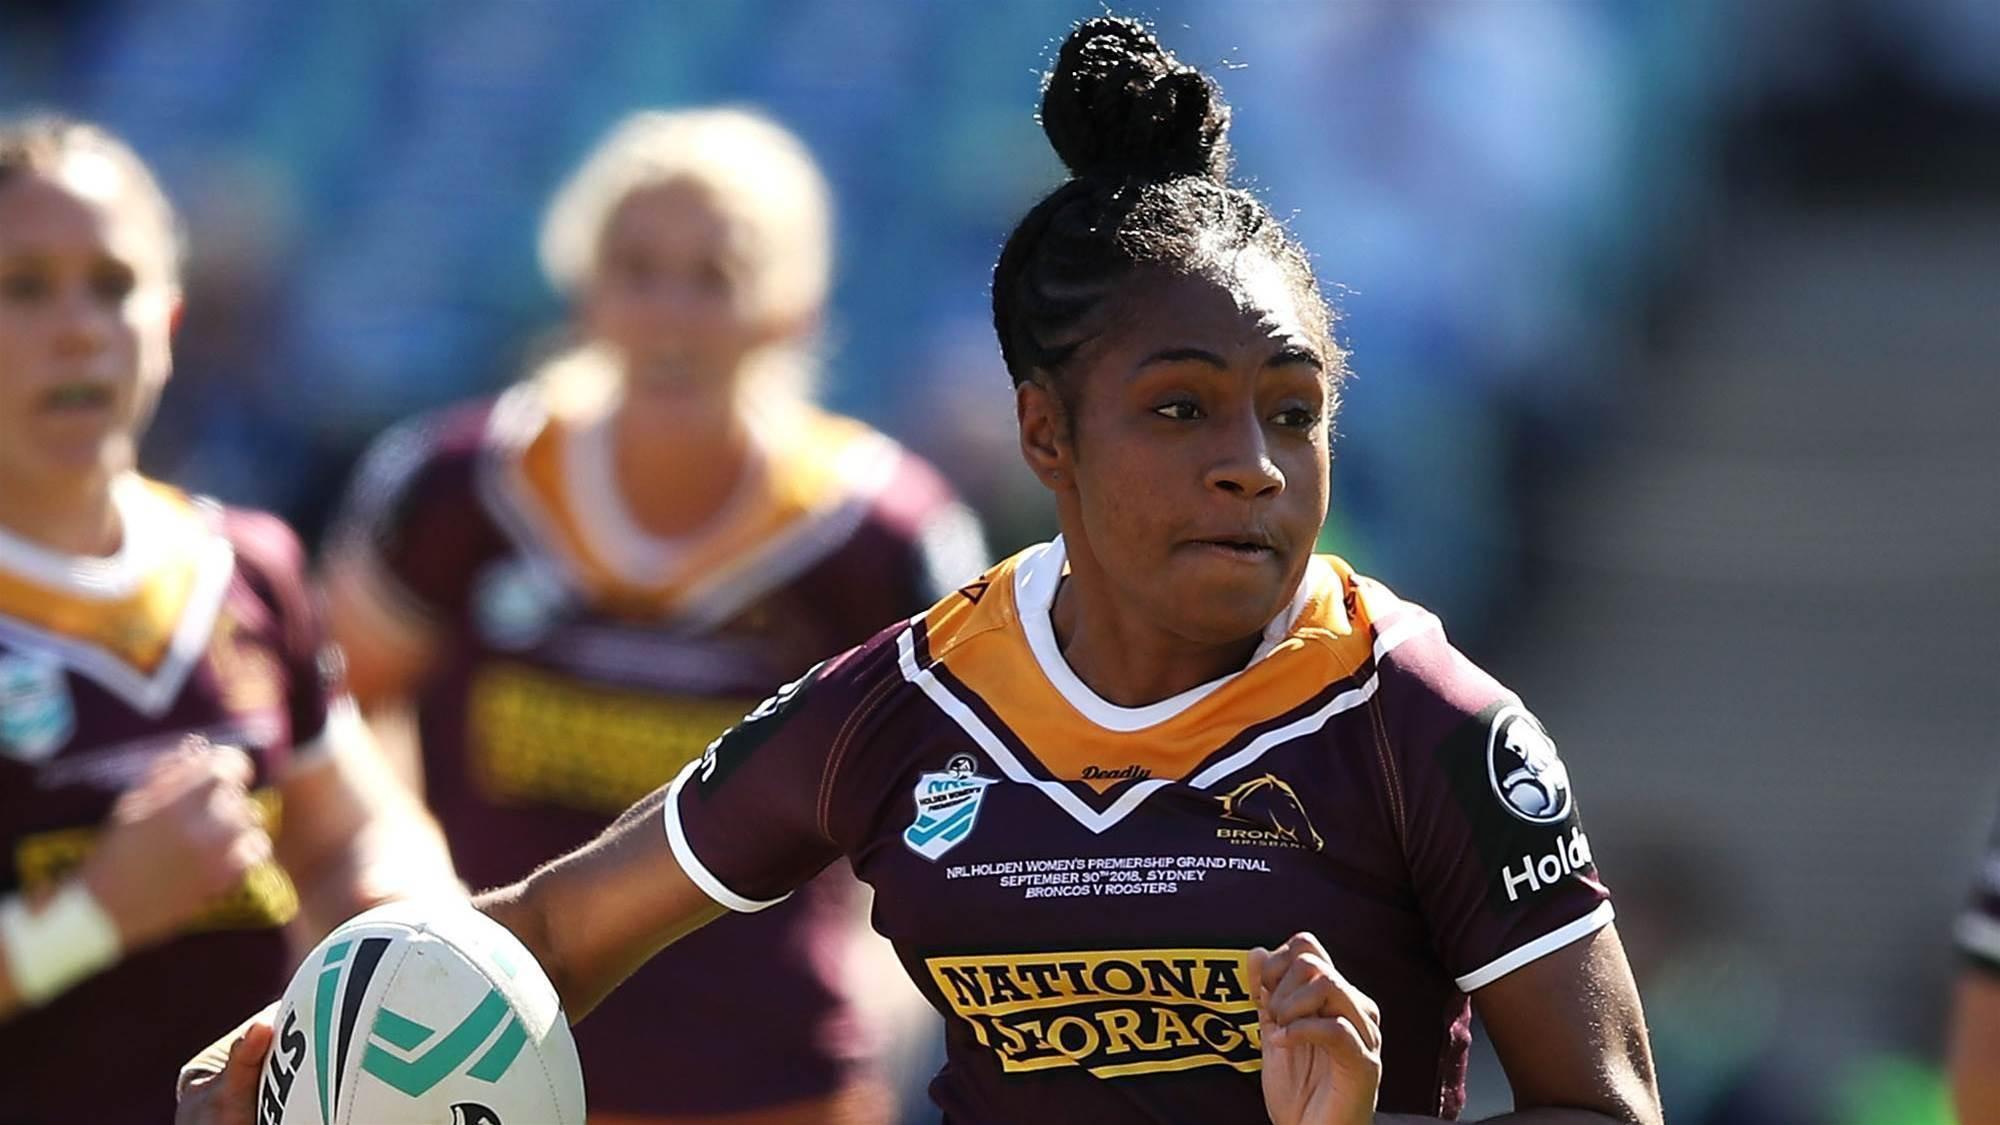 Kuk: Sport can change mindsets on women